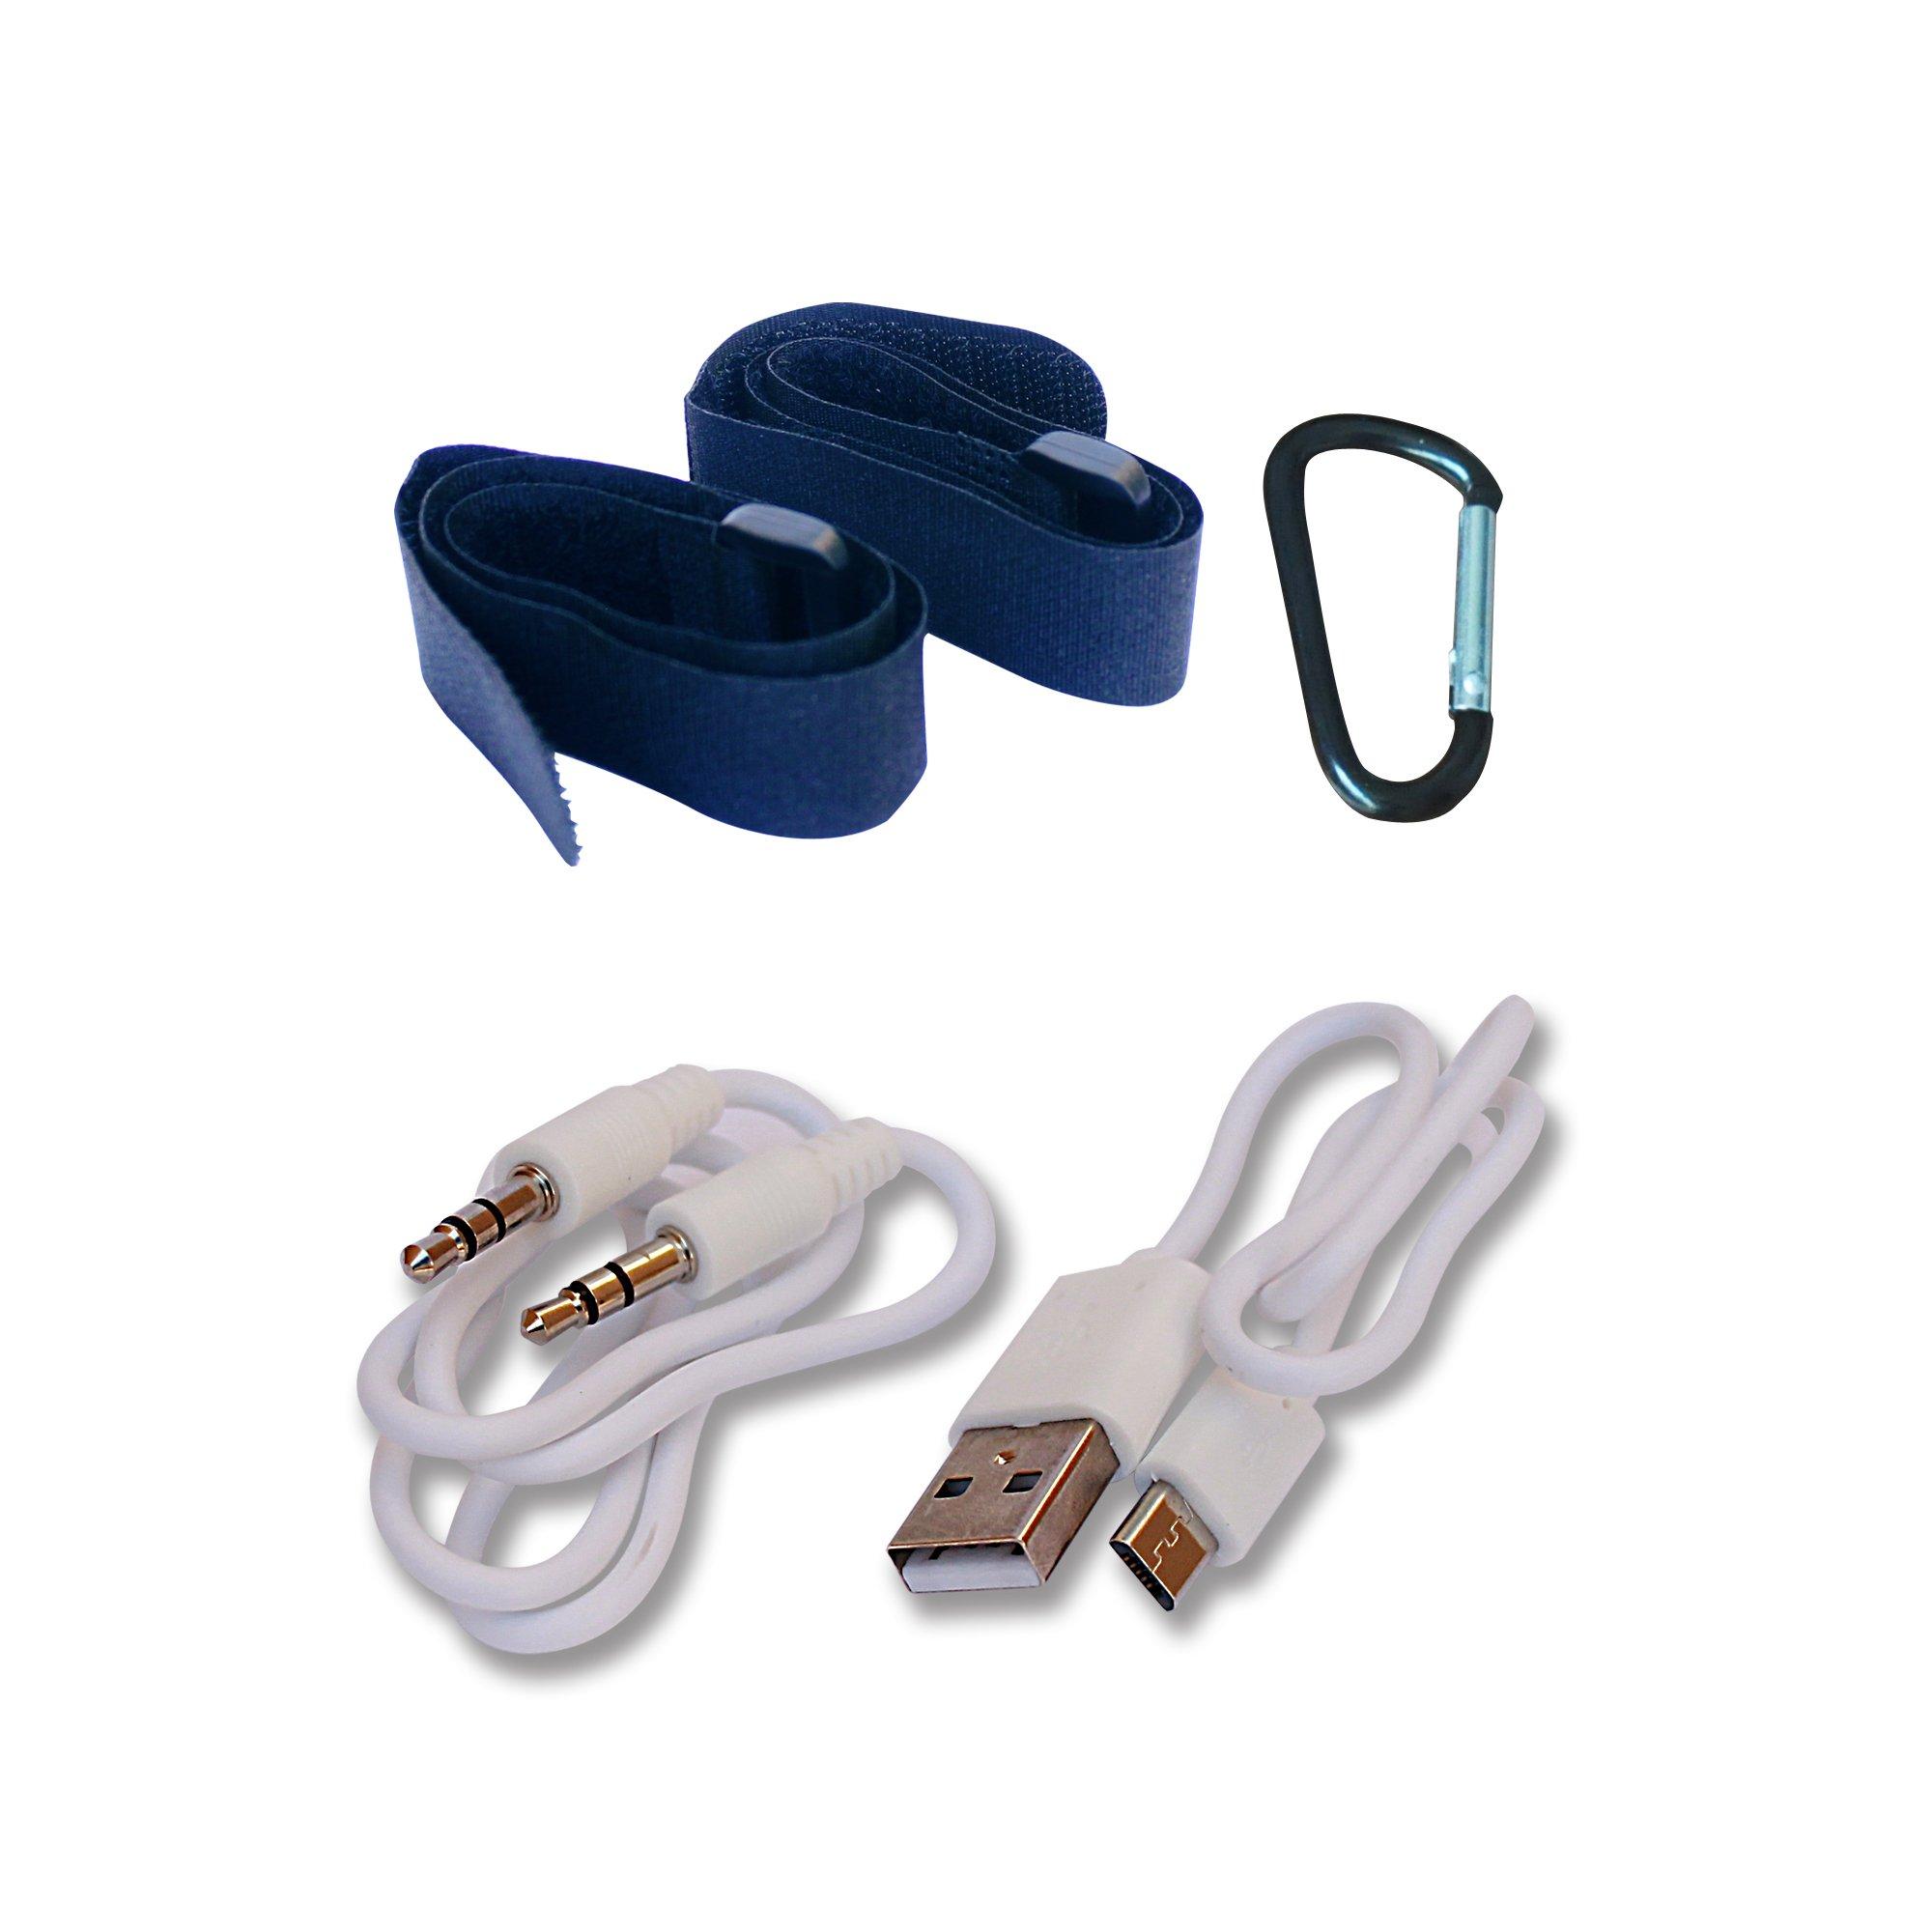 Solar Bluetooth Speaker Nuboom 55+ Hours Playtime 10W Stereo Strong Bass 4400mAh Power Bank IPX5 Splashproof 5V/220mA Solar Panel Bluetooth 4.0 Outdoor Portable Boomer (Skylight Blue) by NUNET